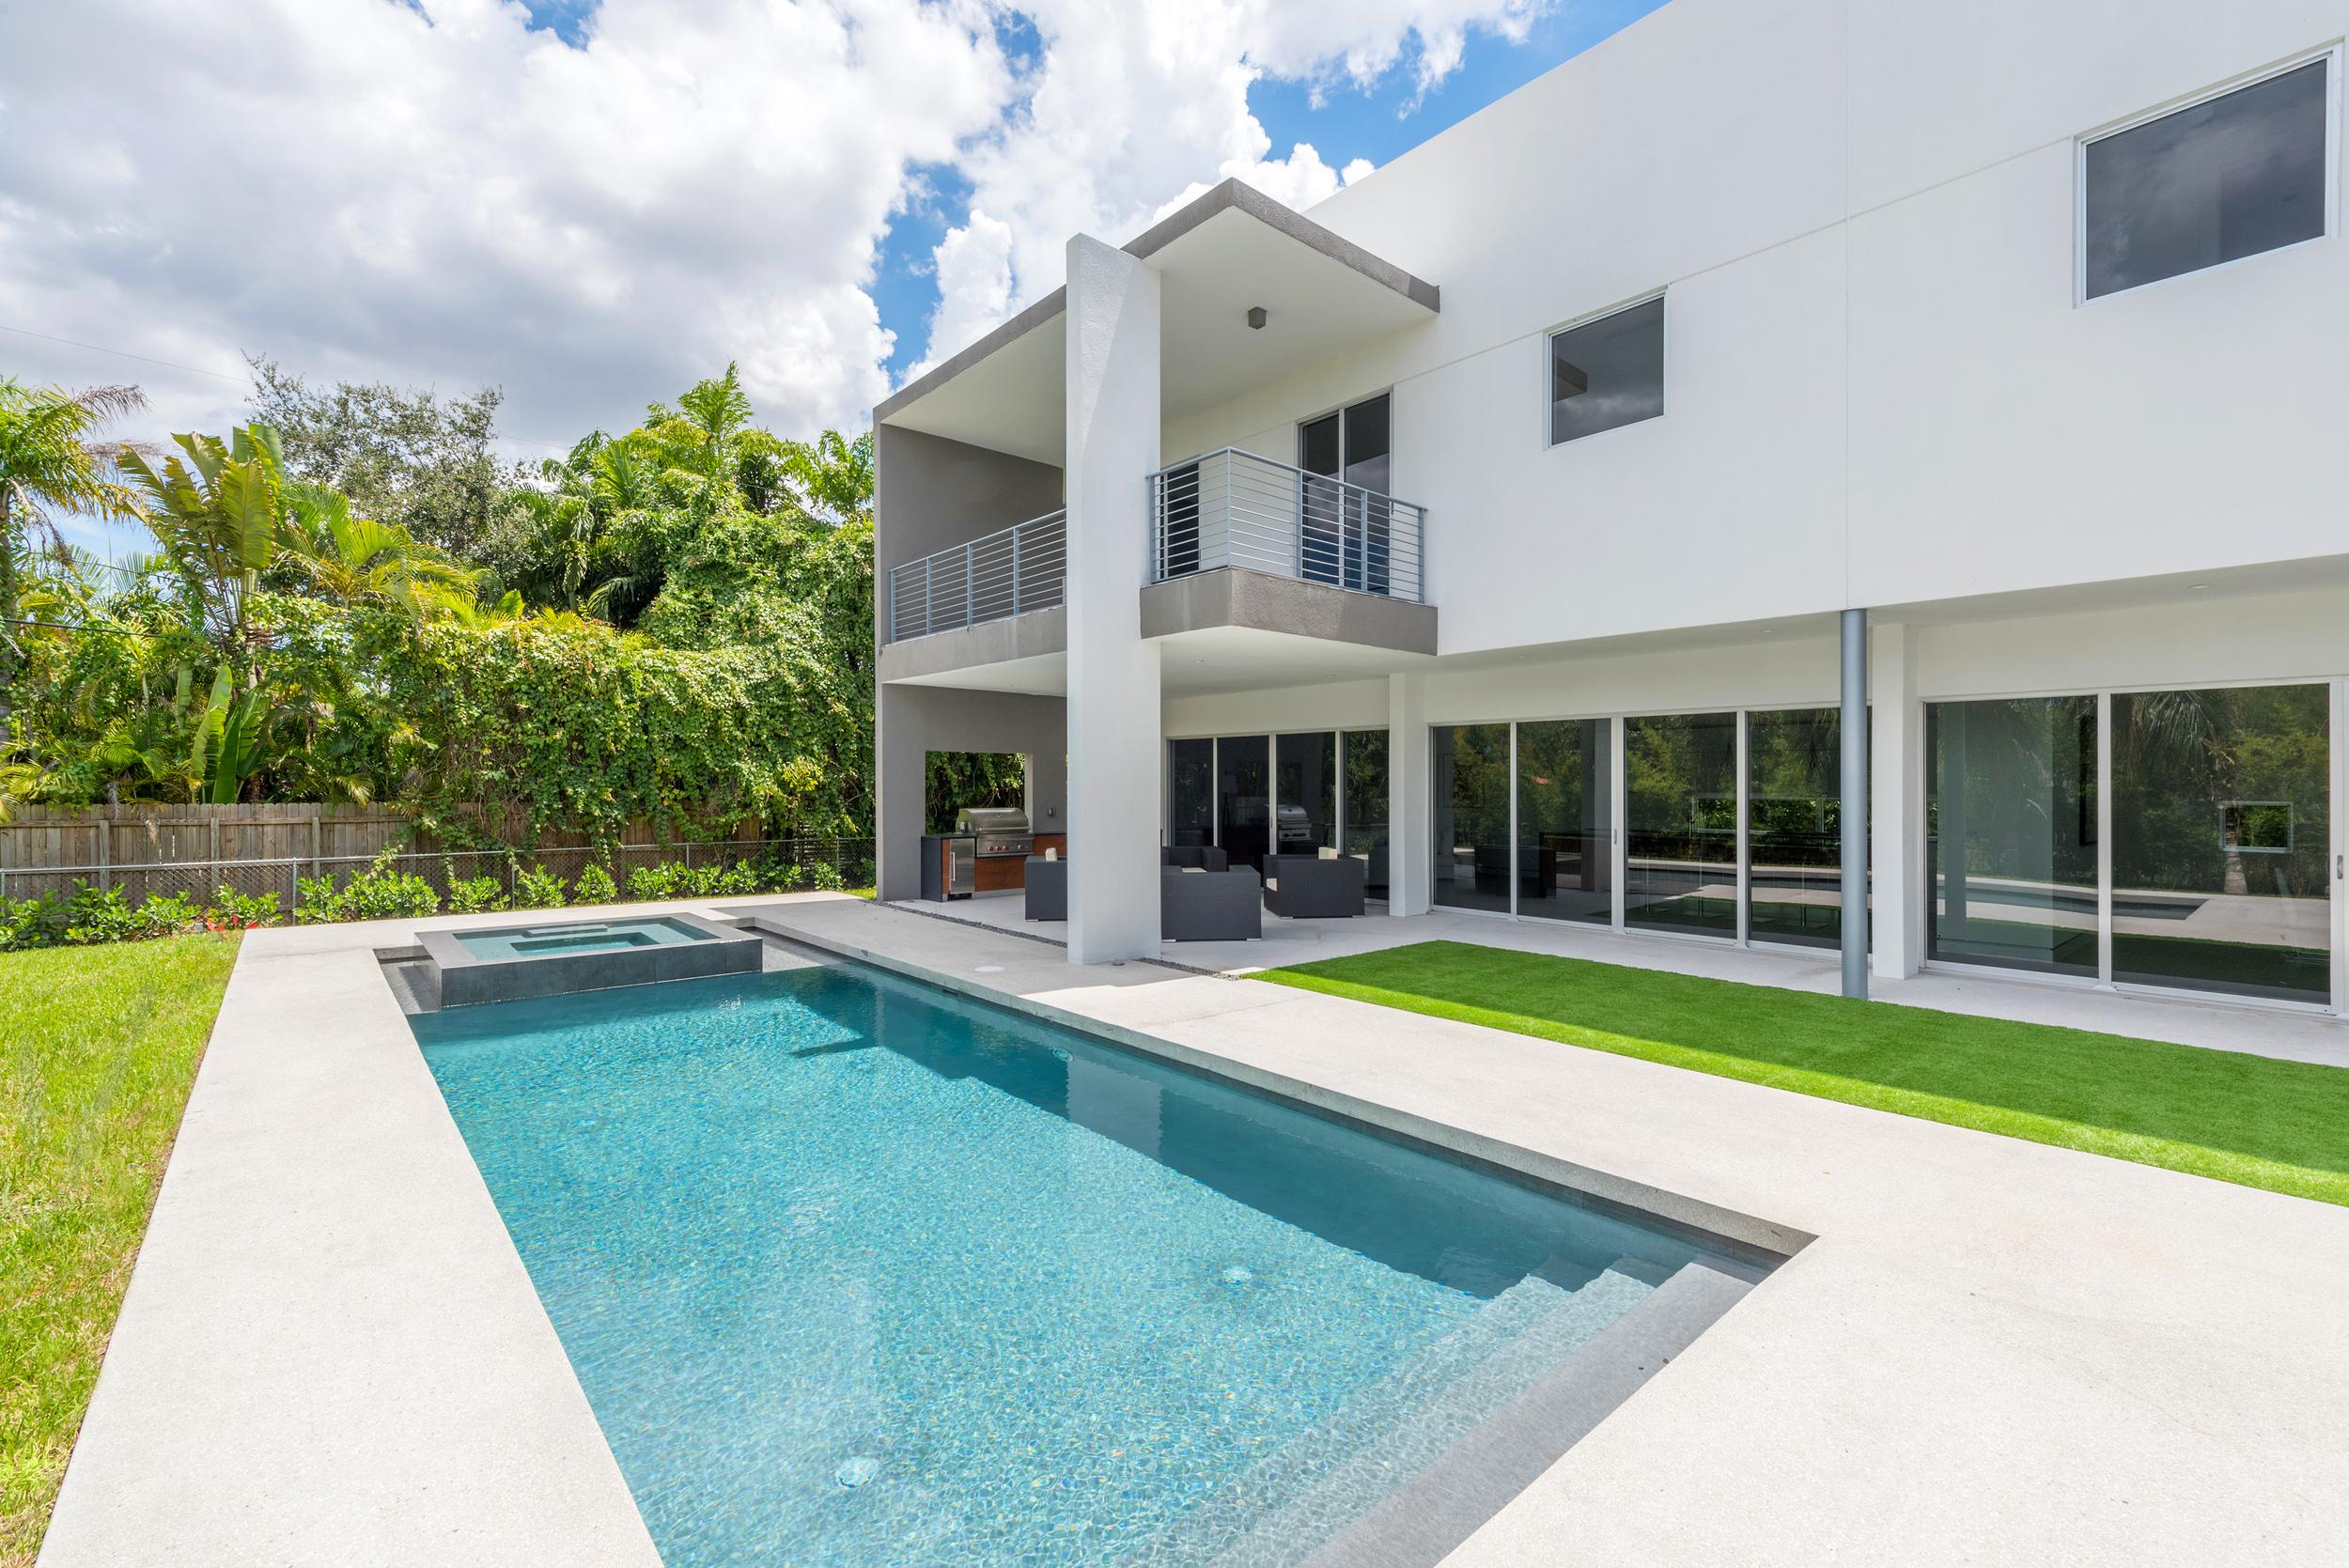 The Setting Homes Plum House Miami Florida Exterior Rear Pool TARIS Real Estate